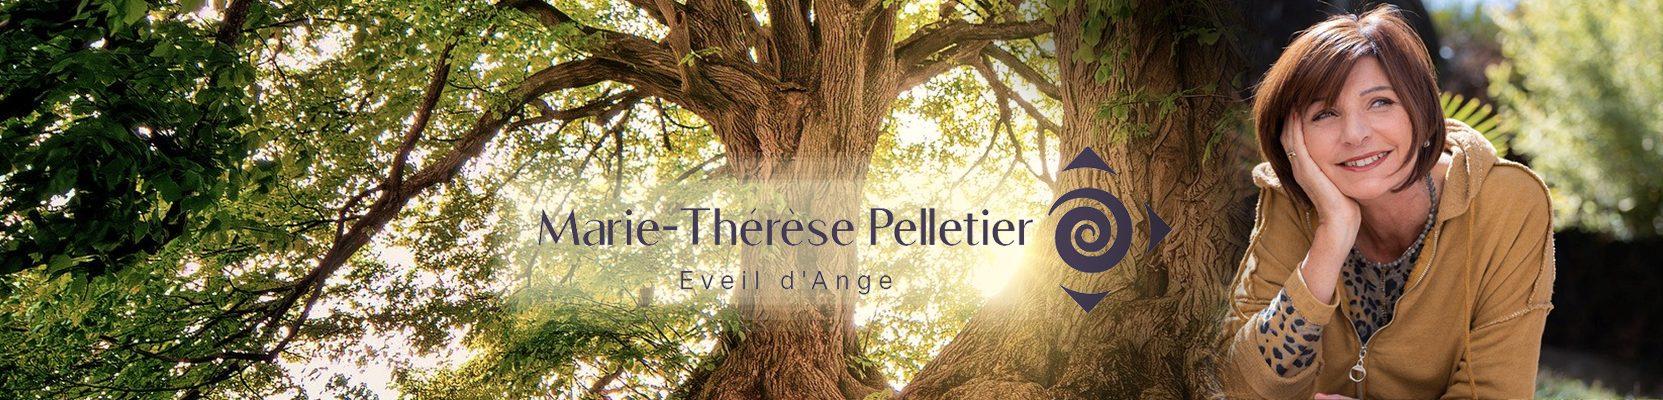 Eveil dAnge Marie Thérèse Pelletier